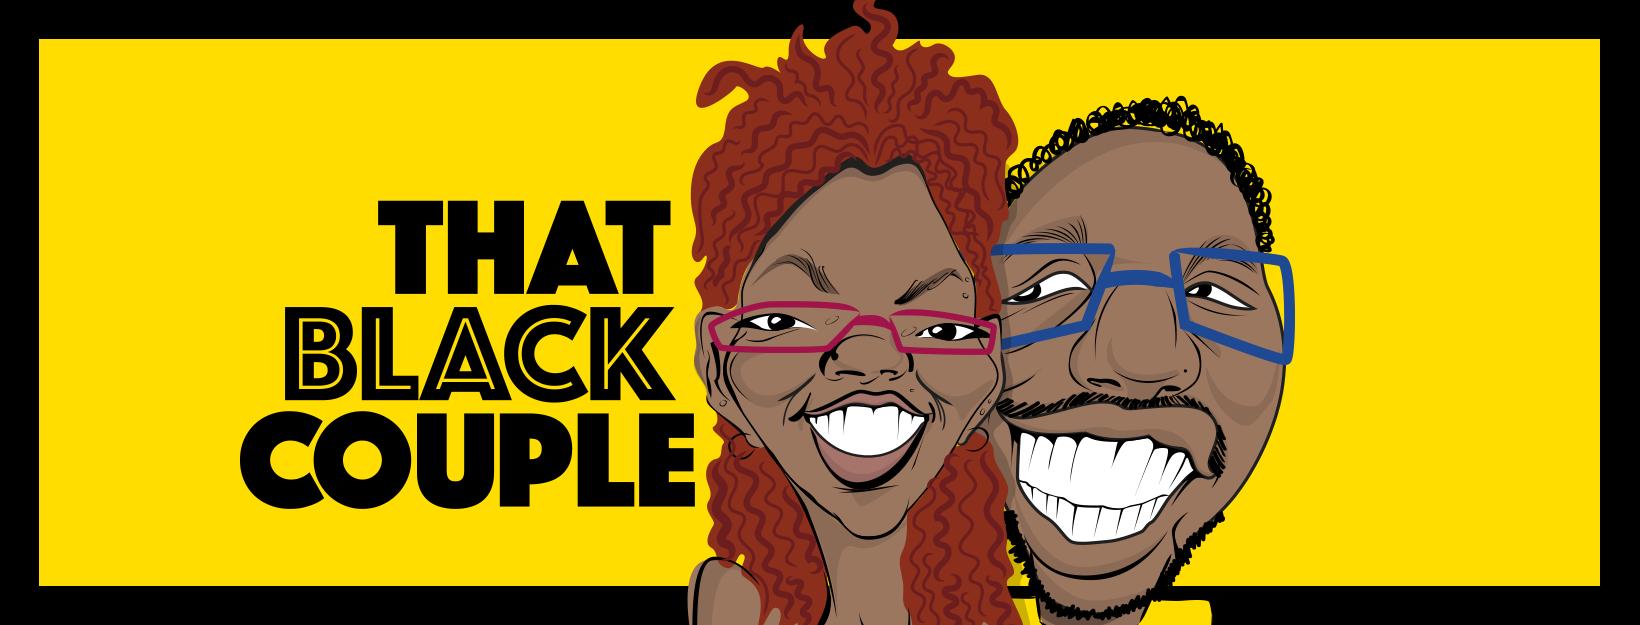 That Black Couple